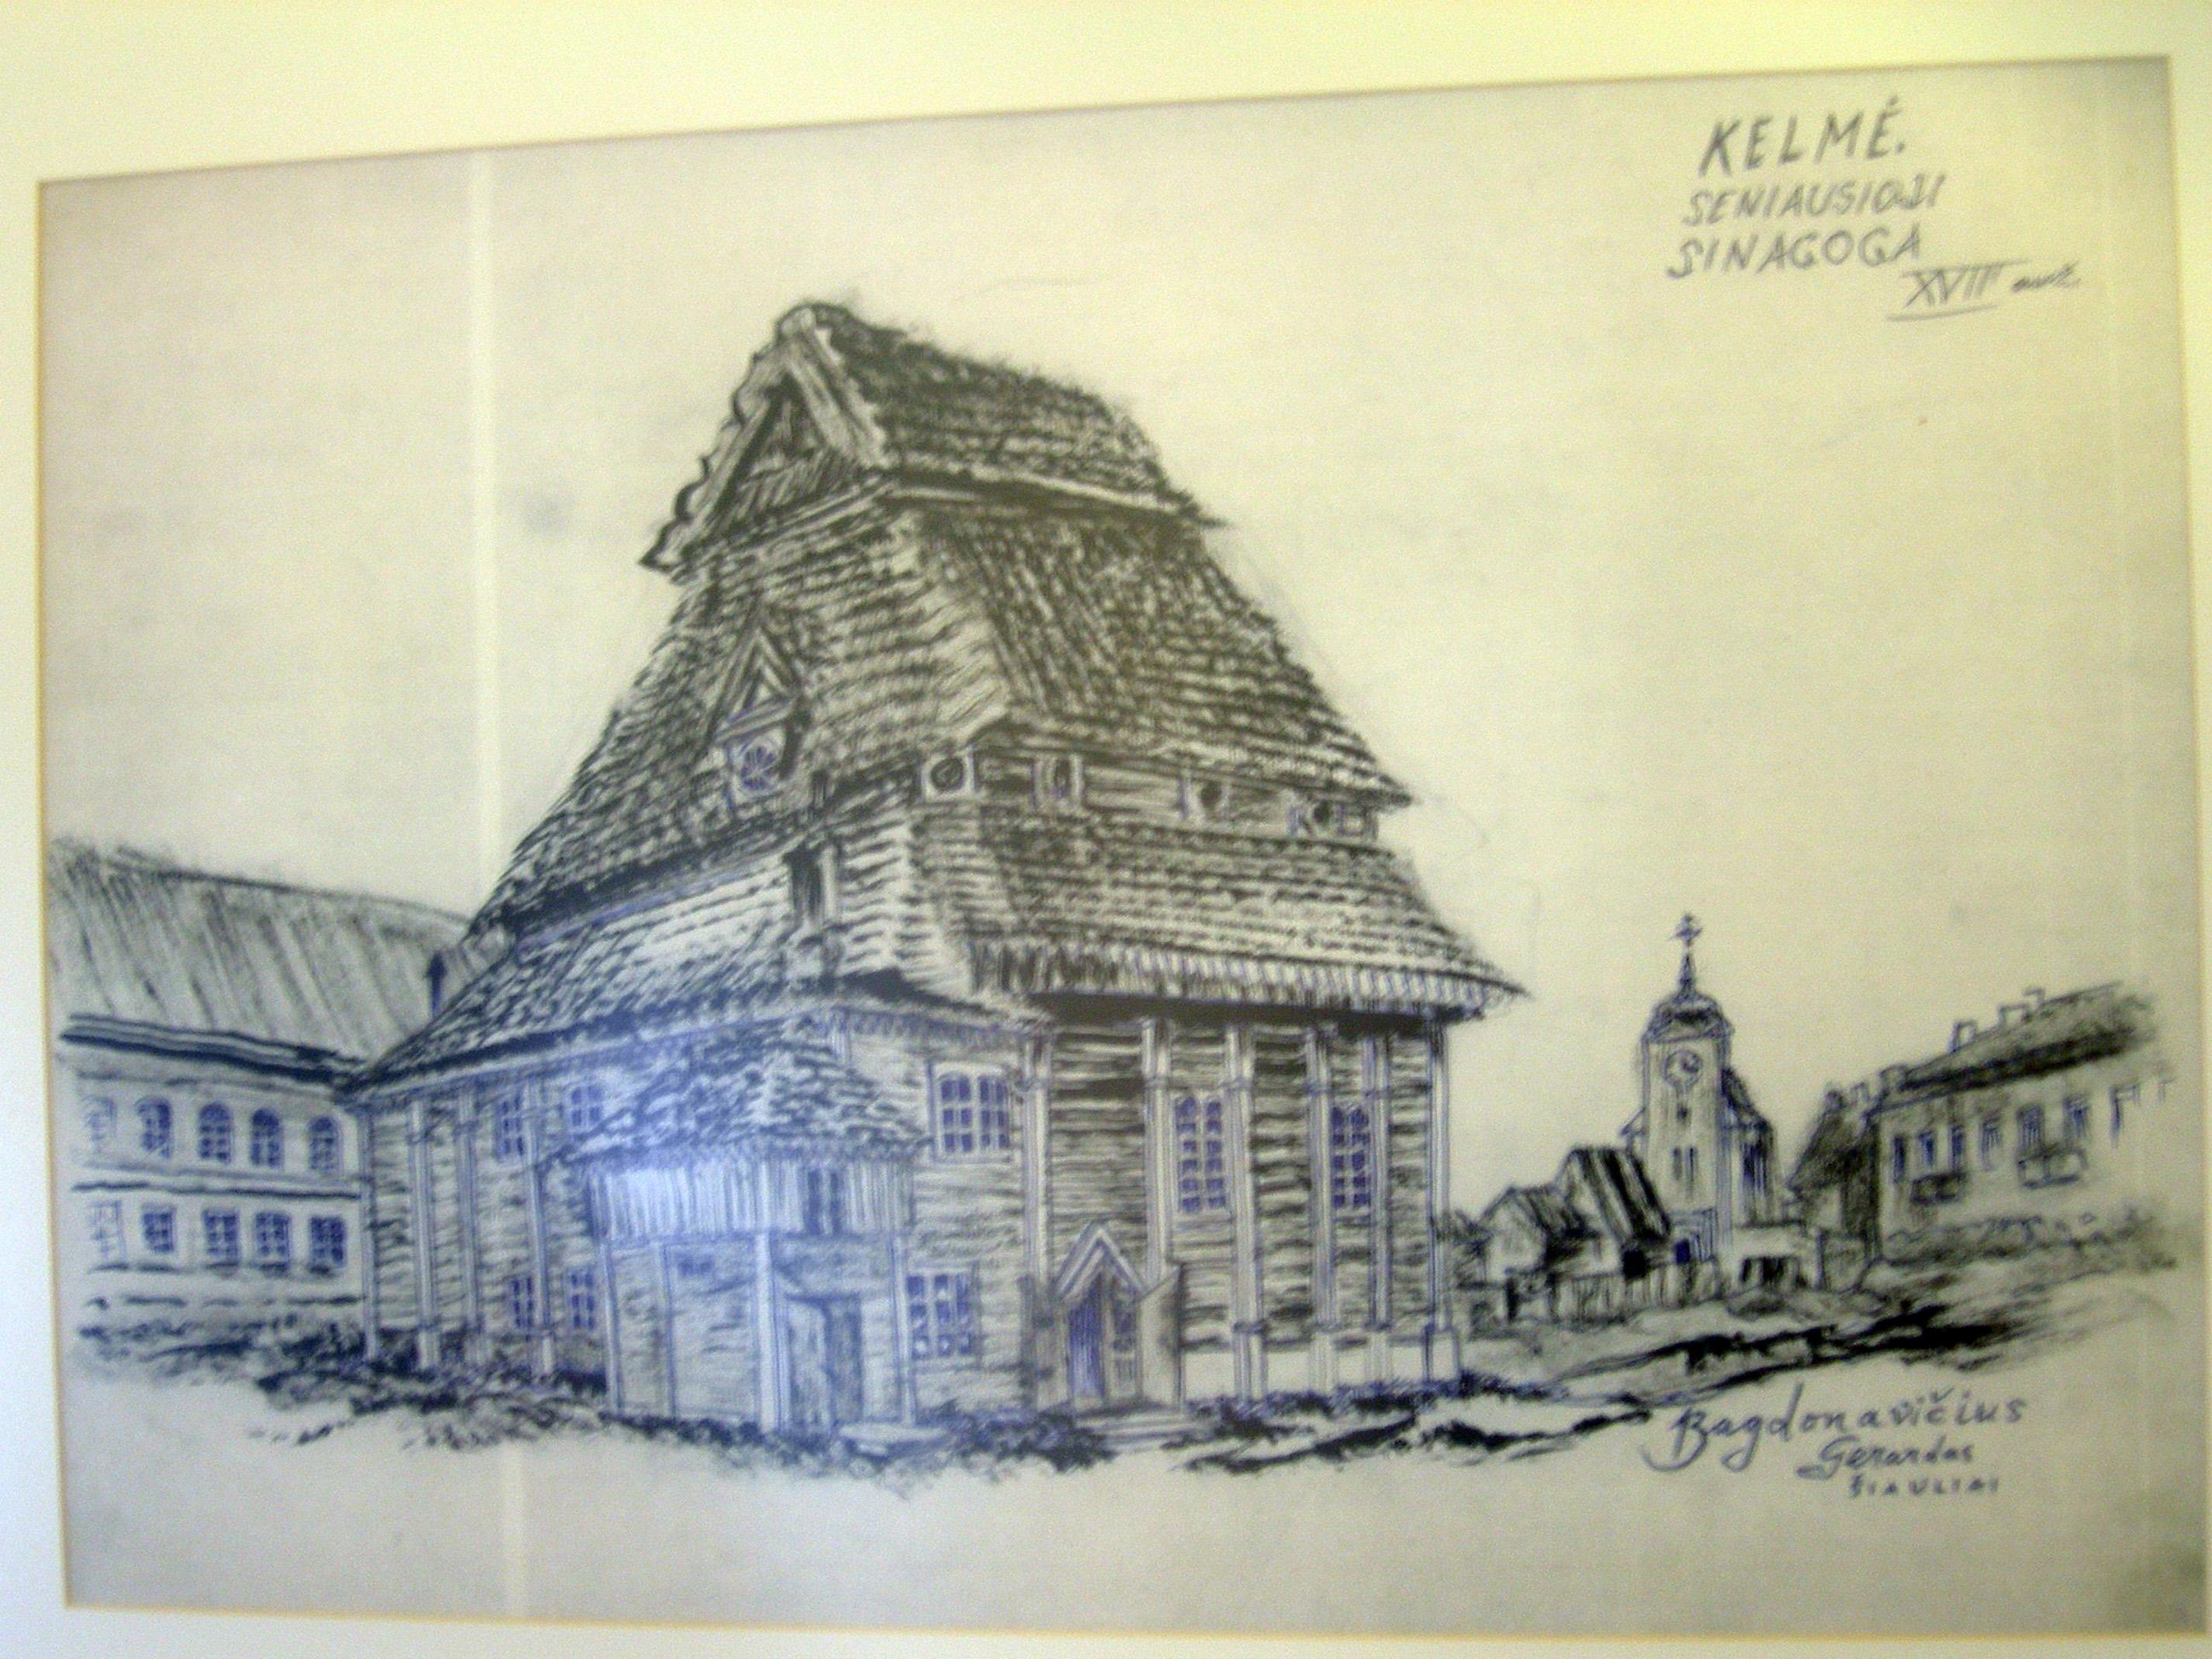 Senoji Kelmės sinagoga